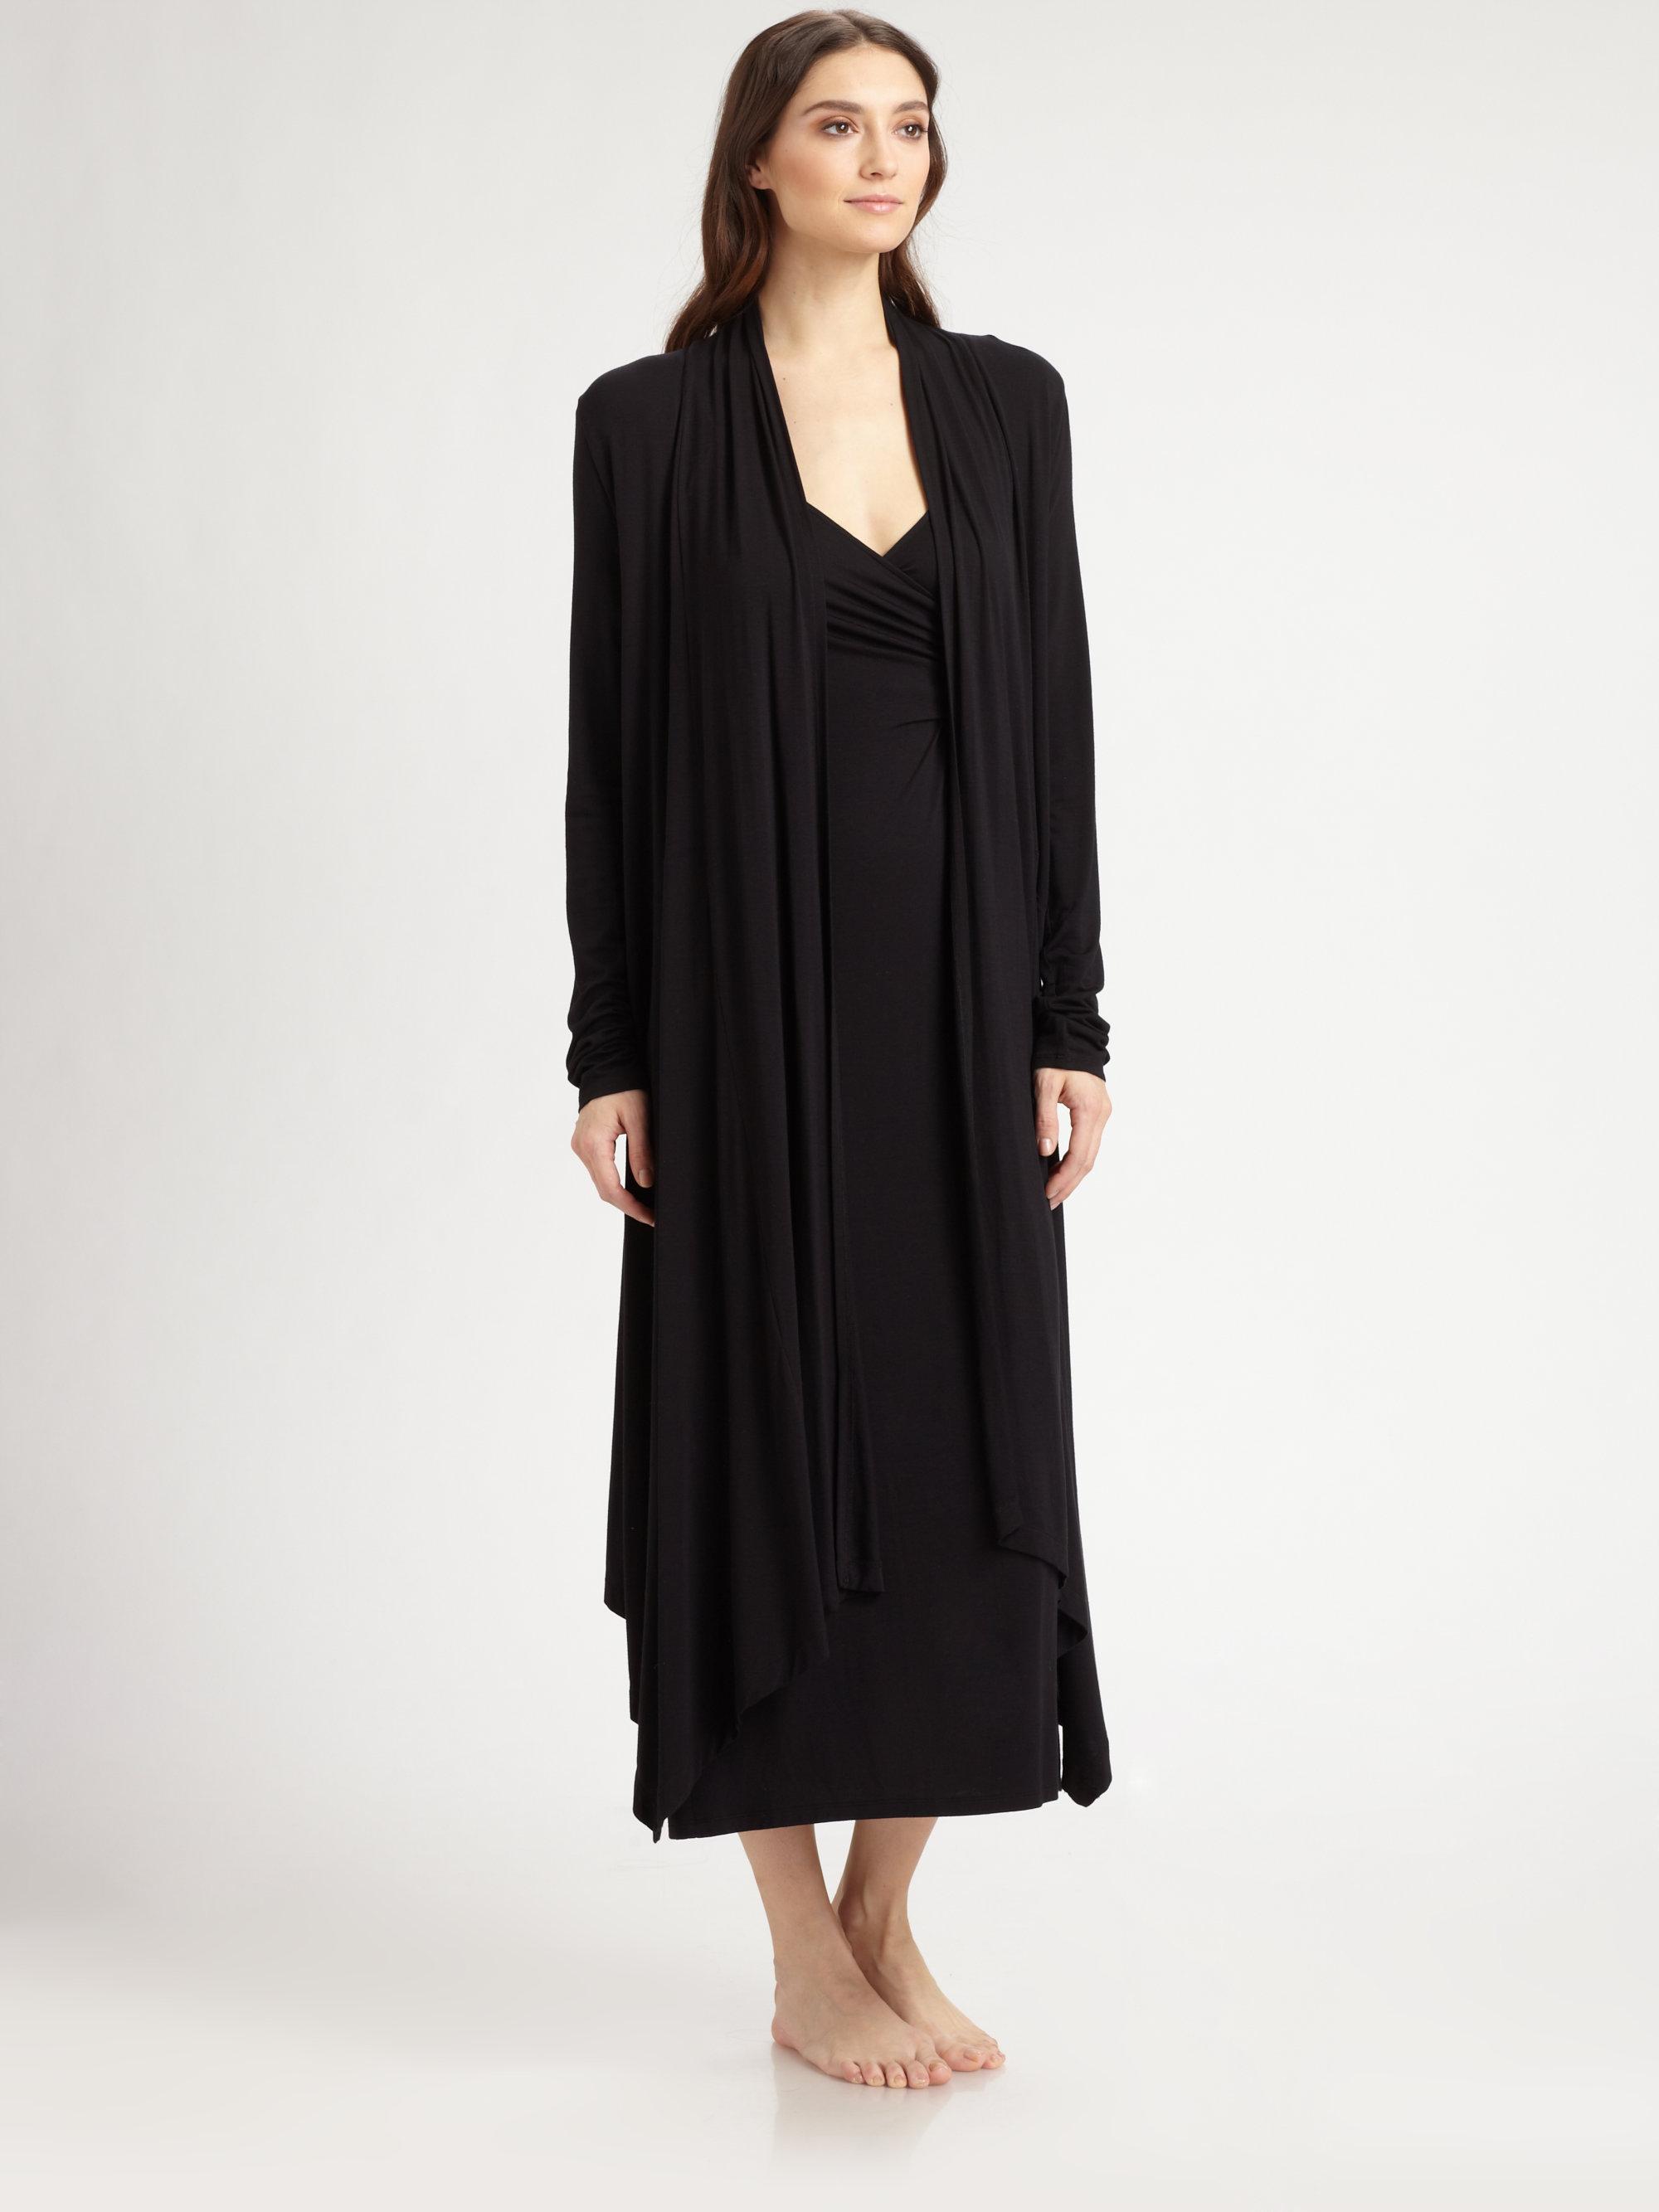 Donna karan new york long jersey wrap in black lyst for Donna karan new york